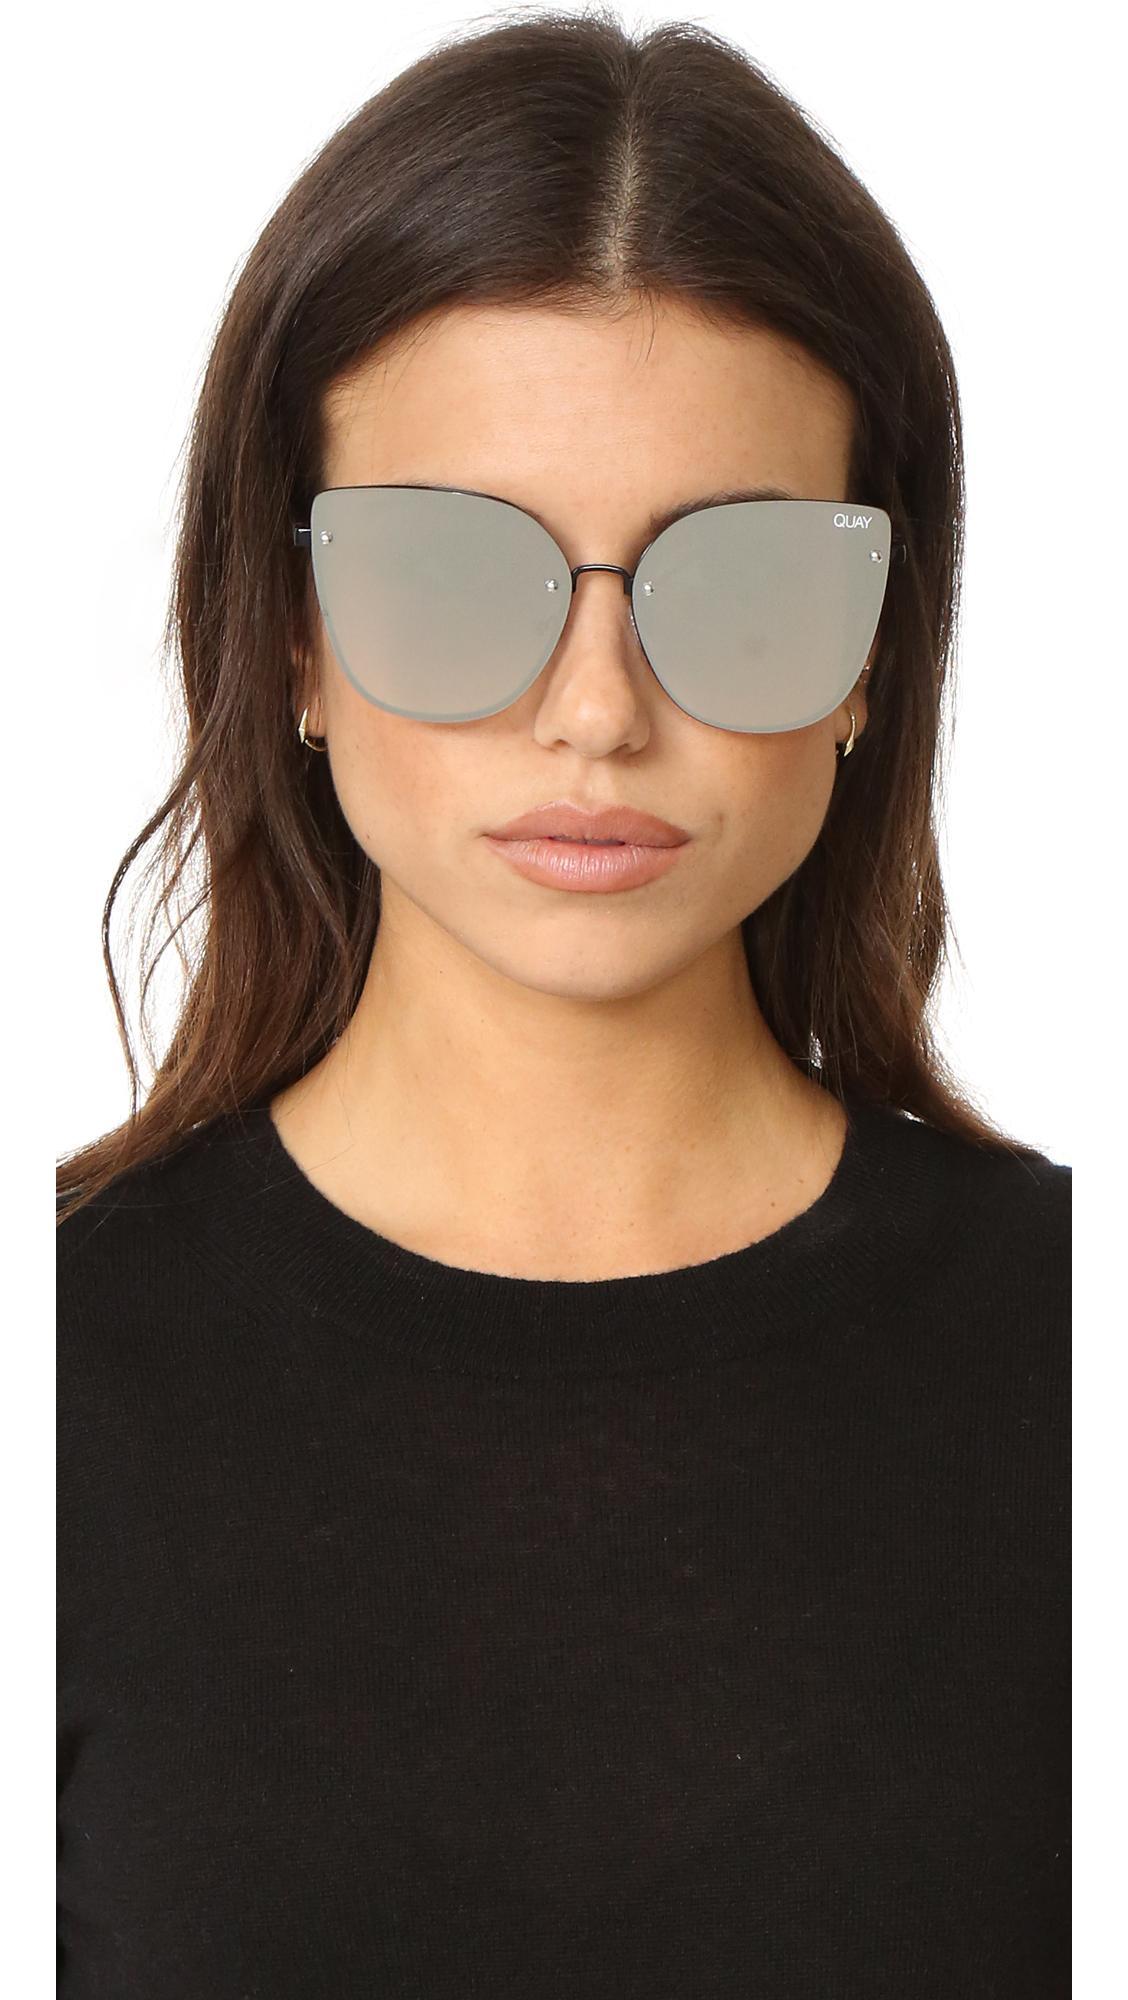 ea292b4fdef Lyst - Quay Lexi Sunglasses